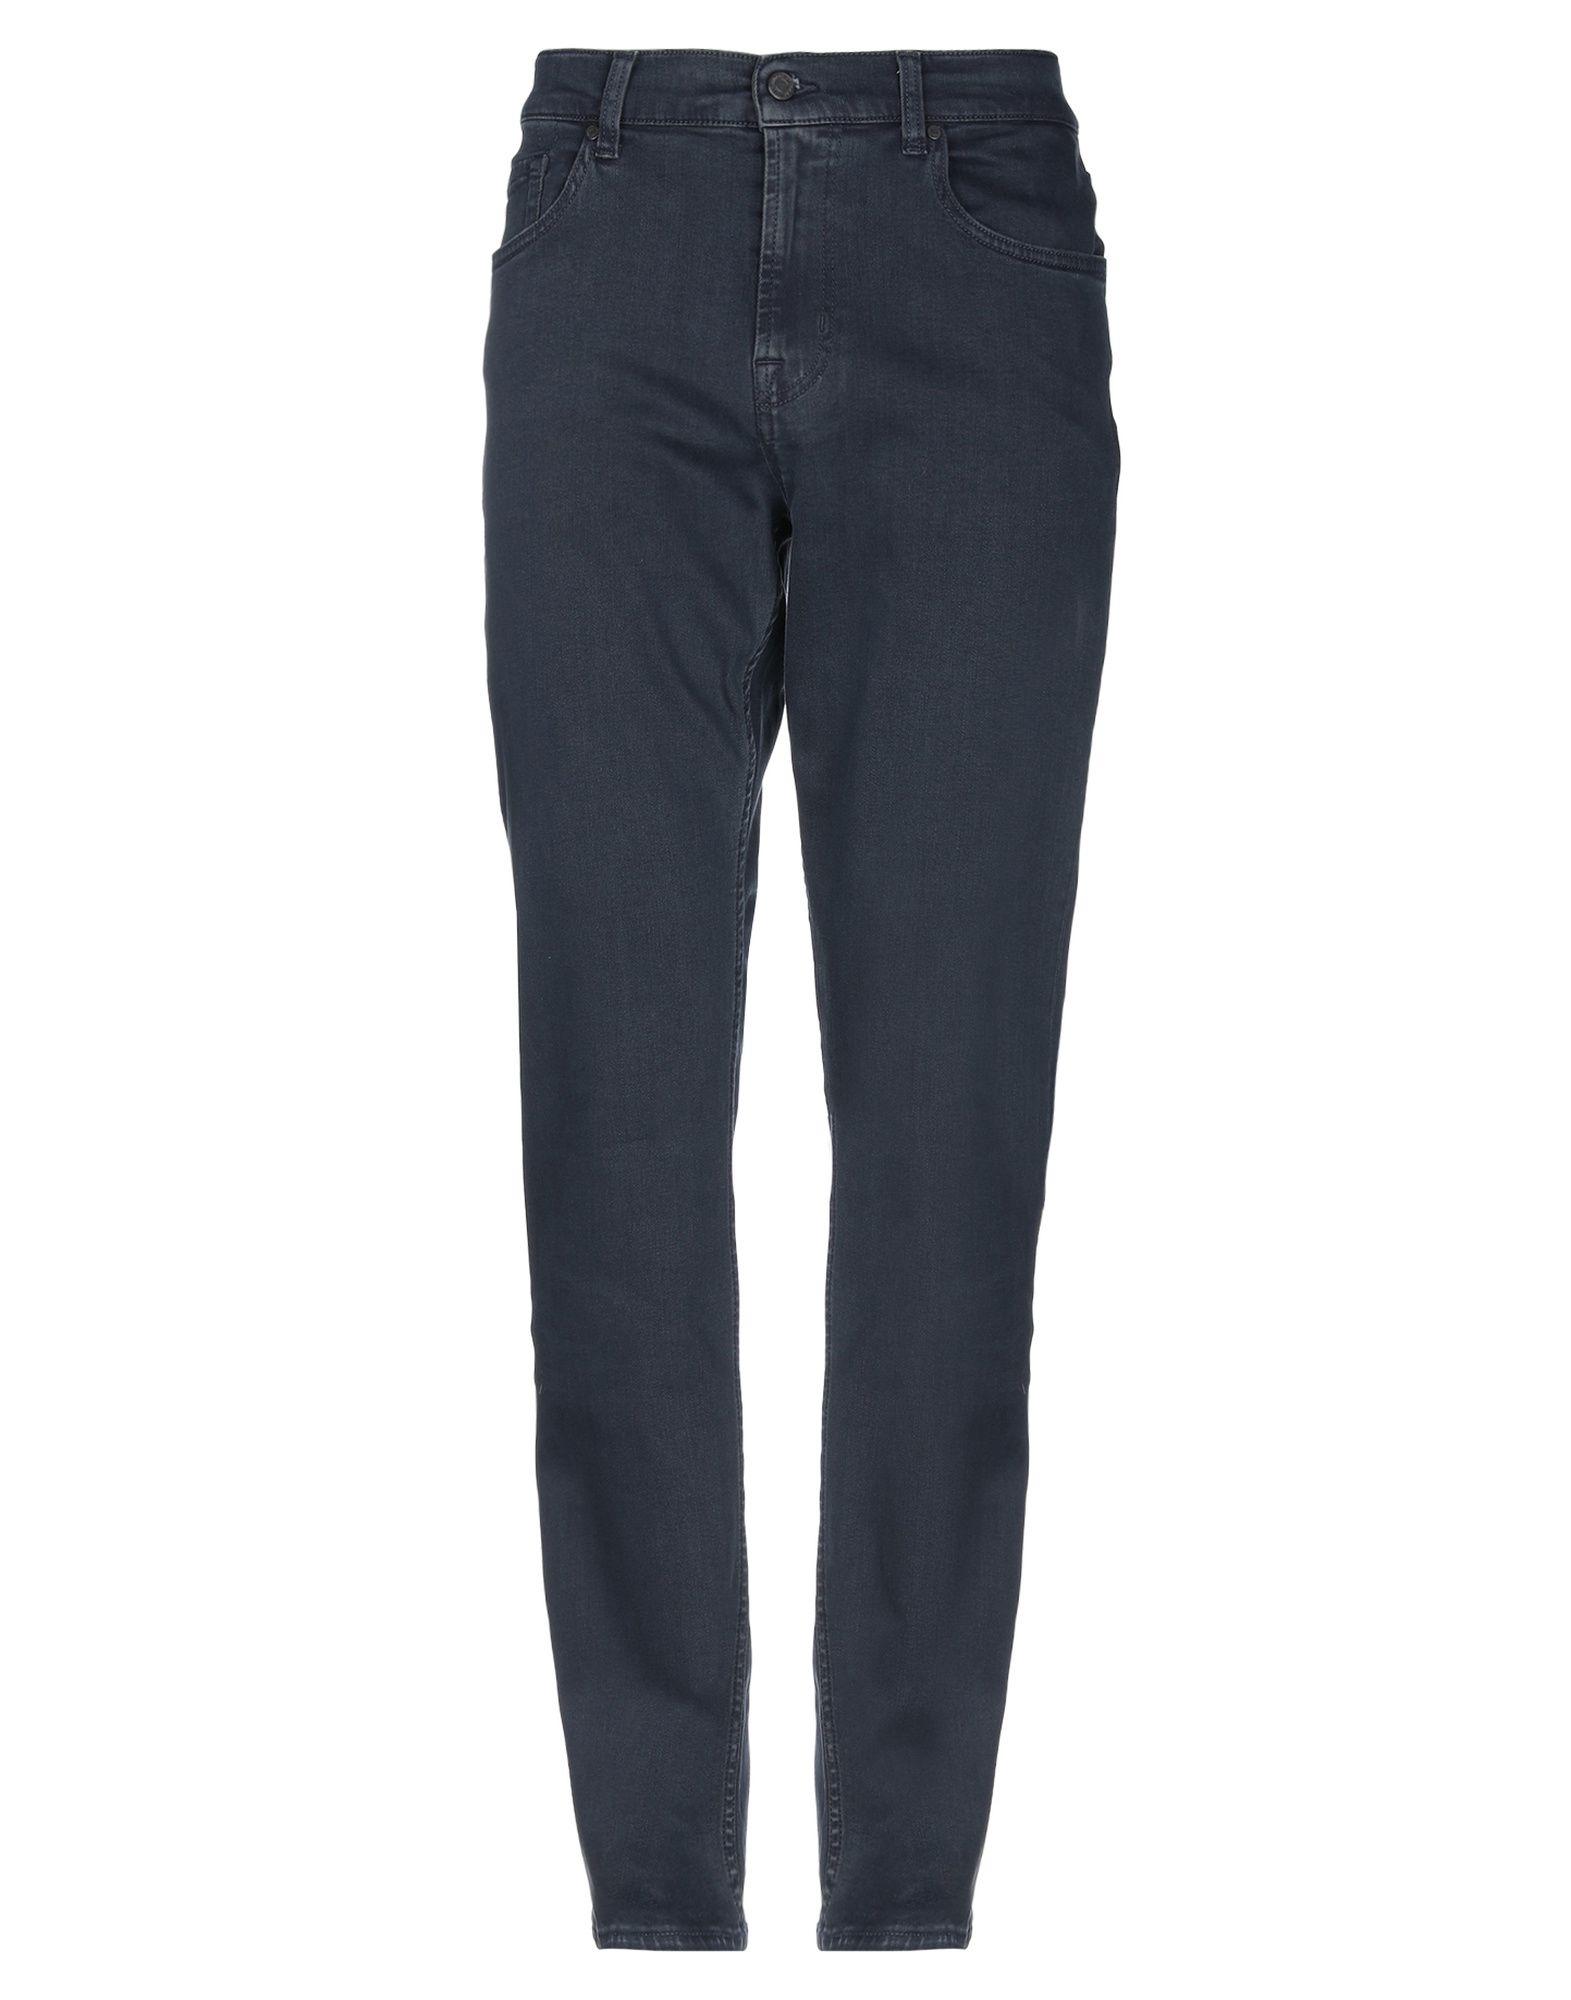 7 FOR ALL MANKIND Джинсовые брюки цены